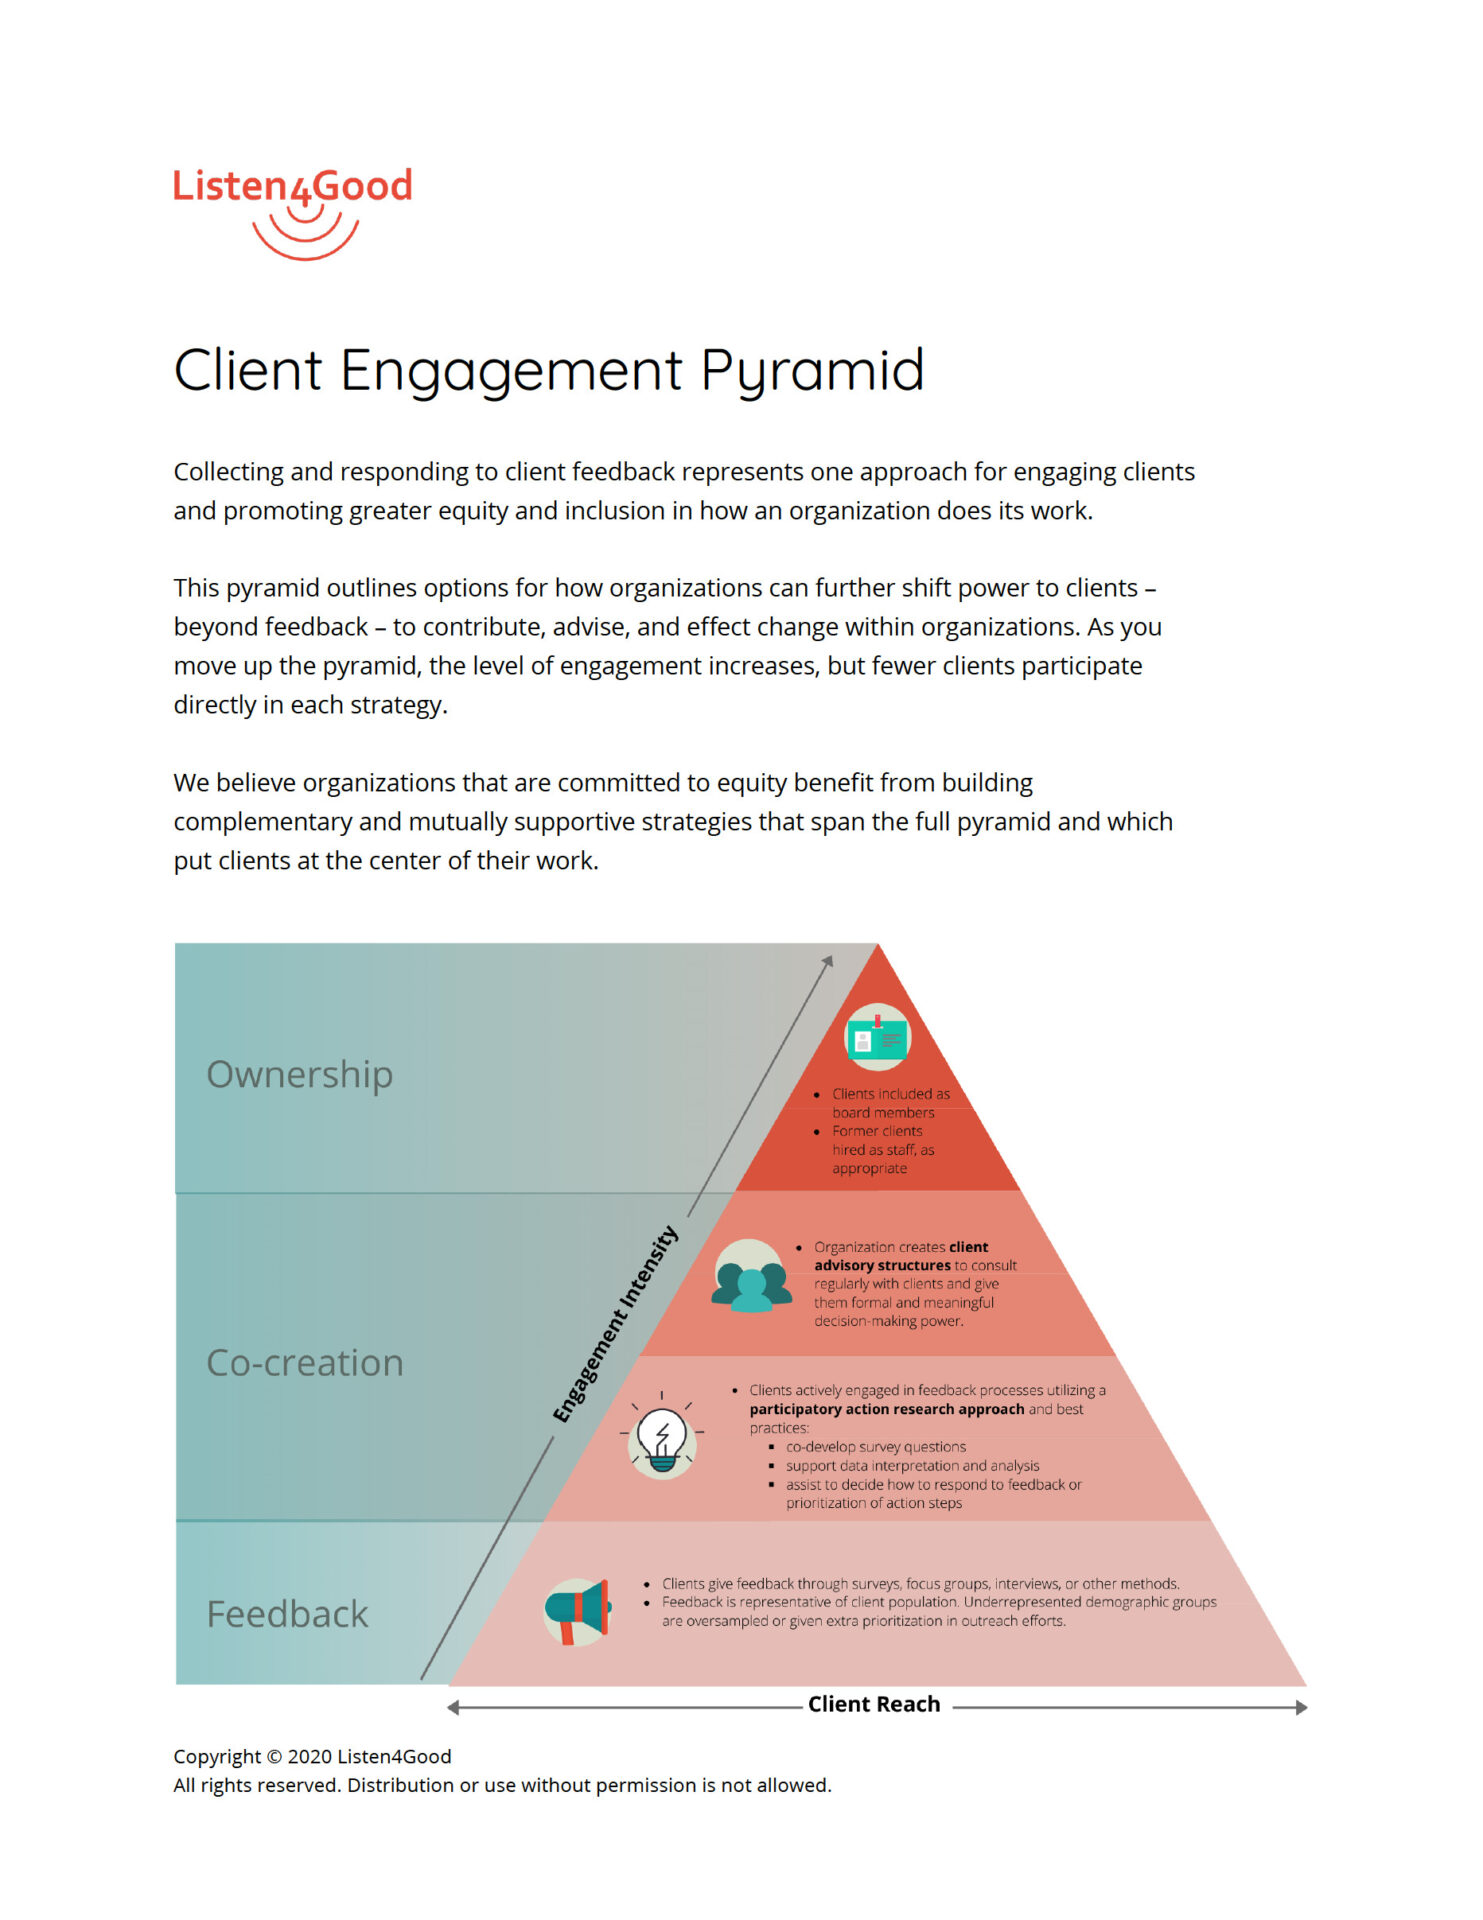 listen4good client engagement pyramid hero image